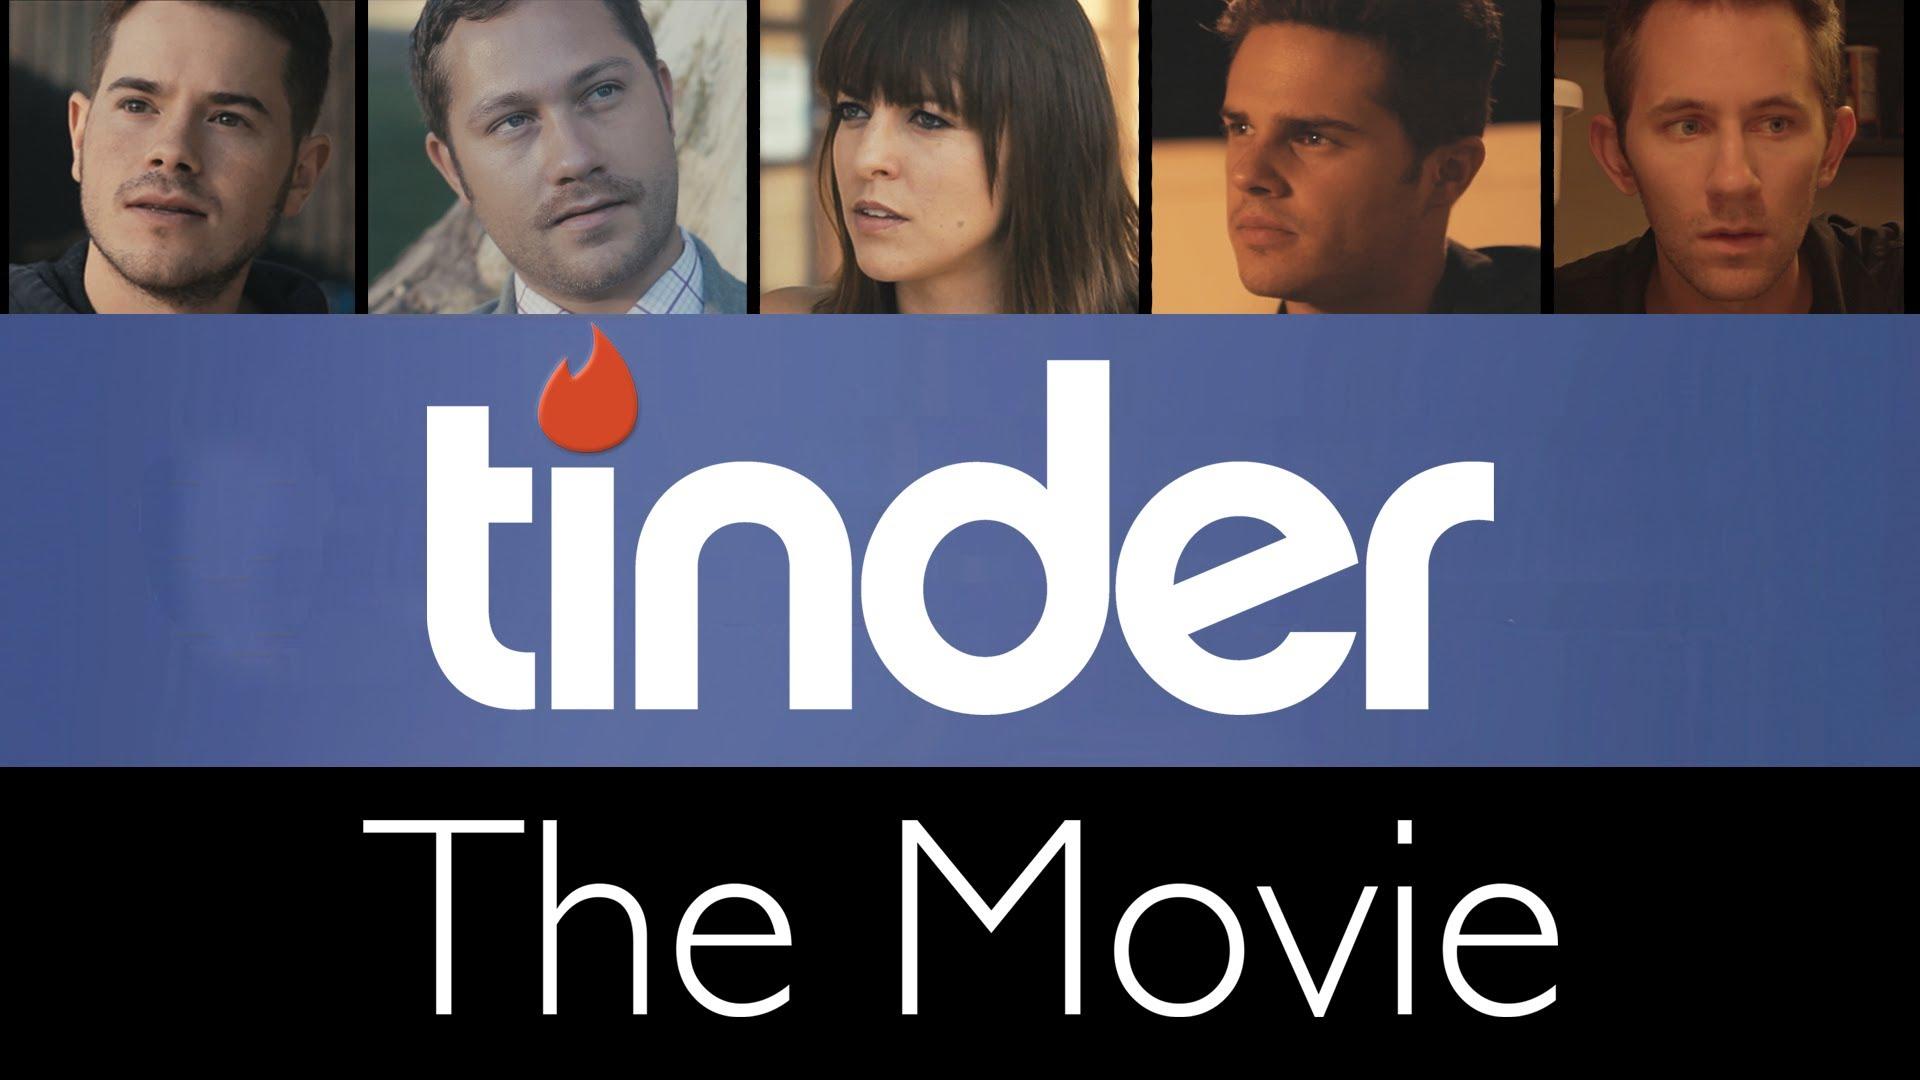 dating app sverige gratis poor film